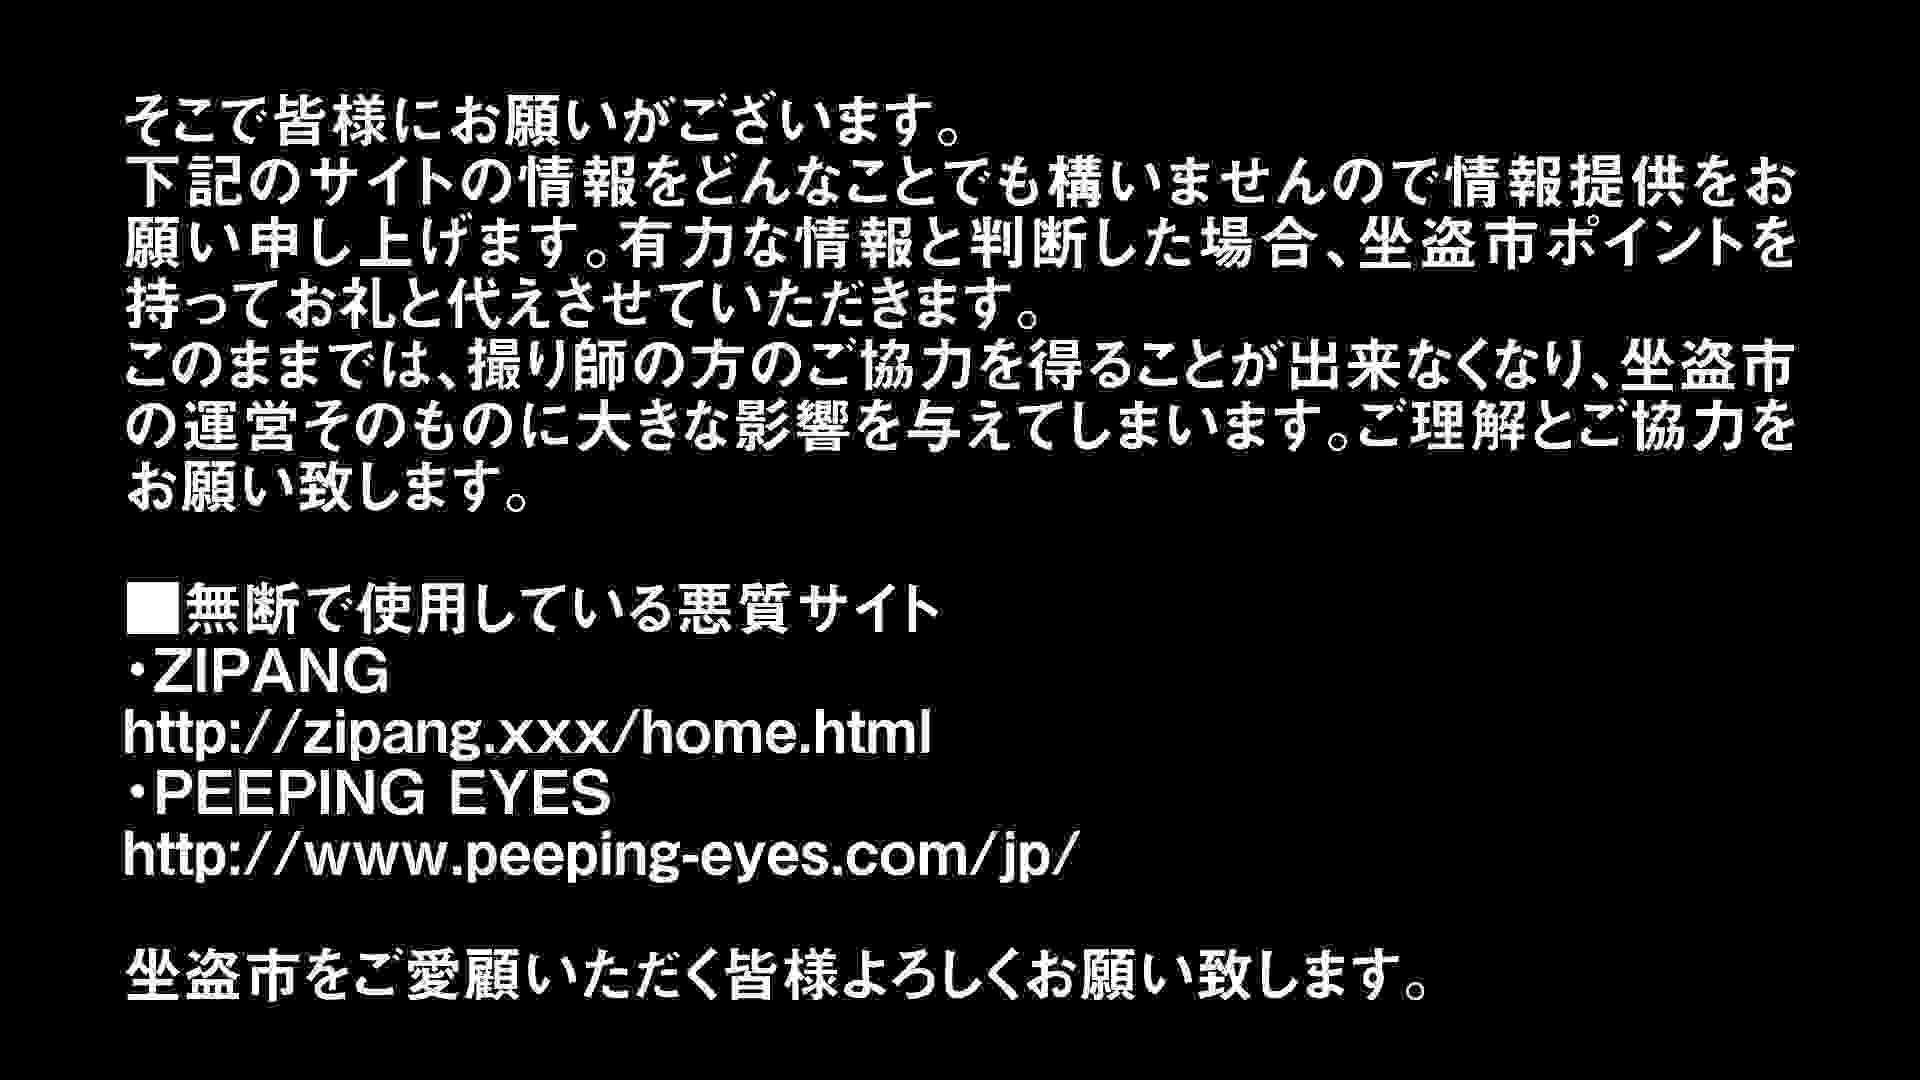 Aquaな露天風呂Vol.299 盗撮シリーズ | 露天風呂編  82PIX 29